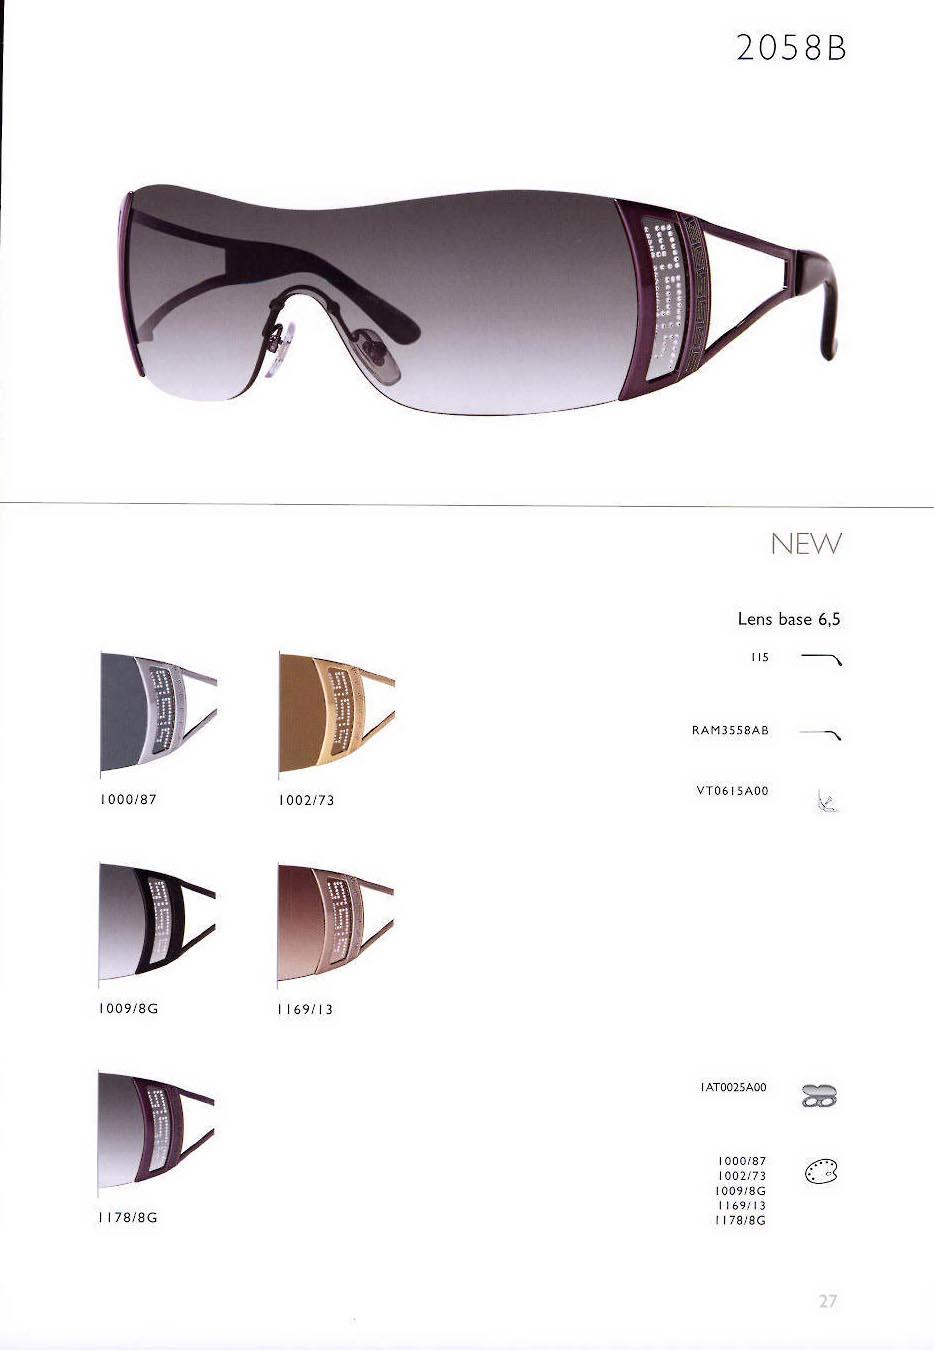 81222e68eaff Sunglasses Versace 2058B 11788G